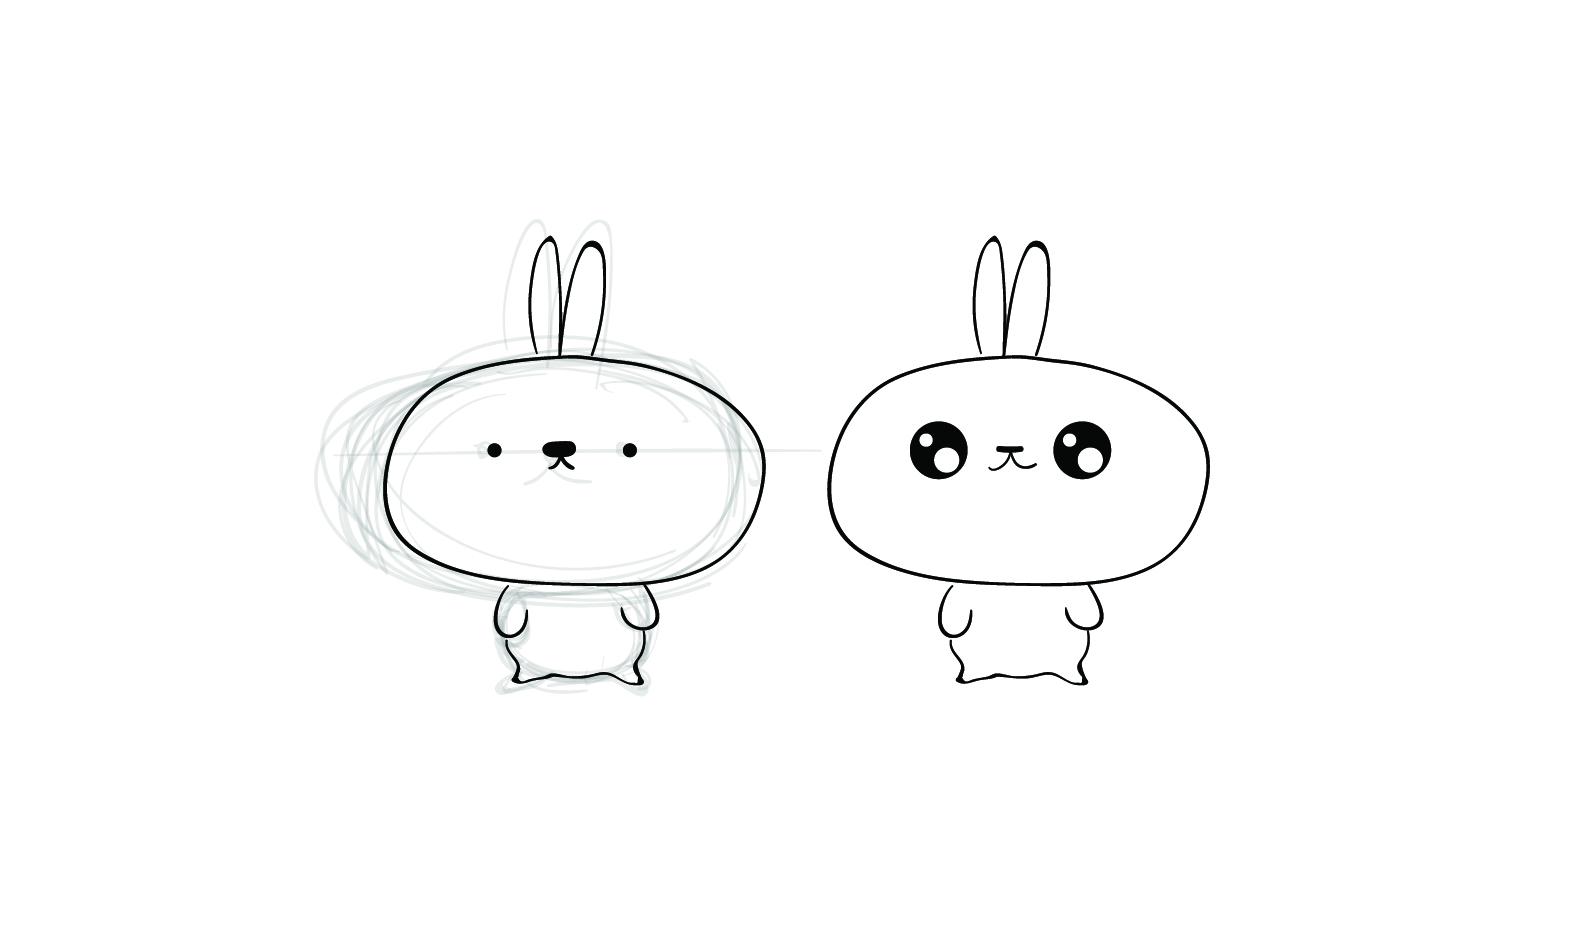 2019-07-08 Bunny concept 2.jpg